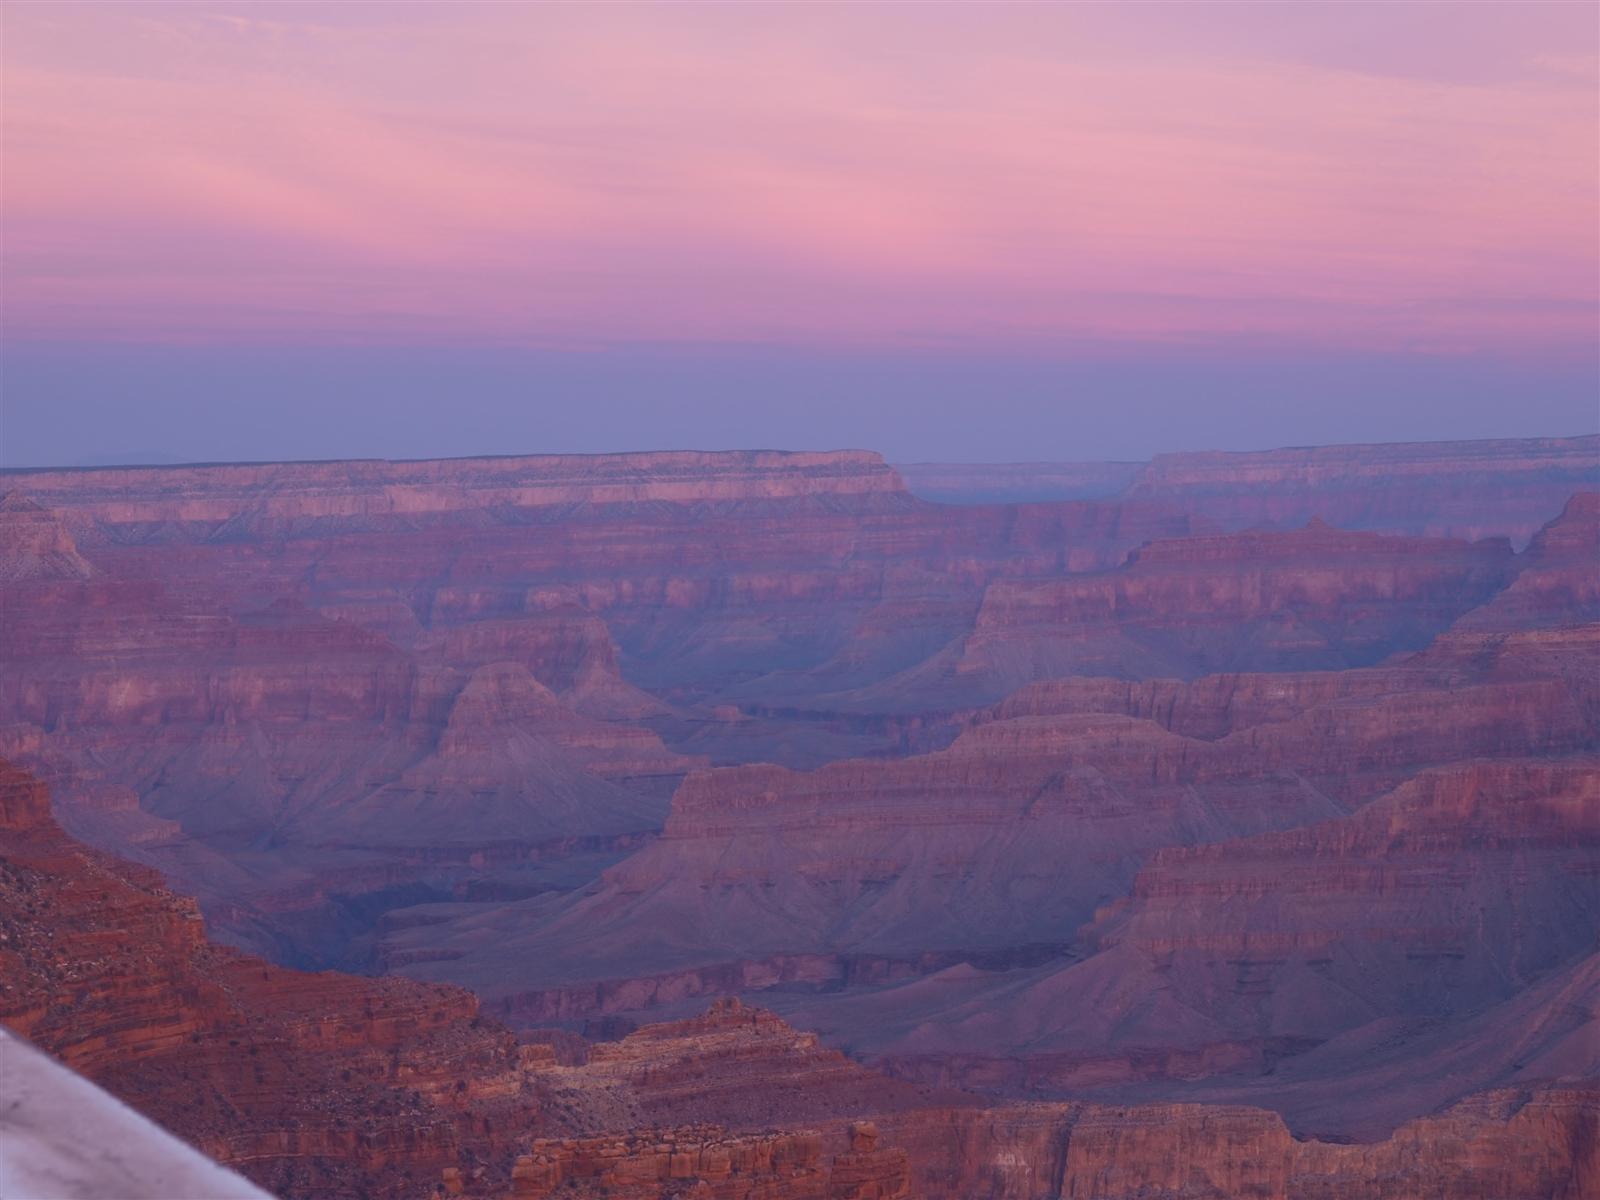 National Park Service Webcam Image - Grand Canyon